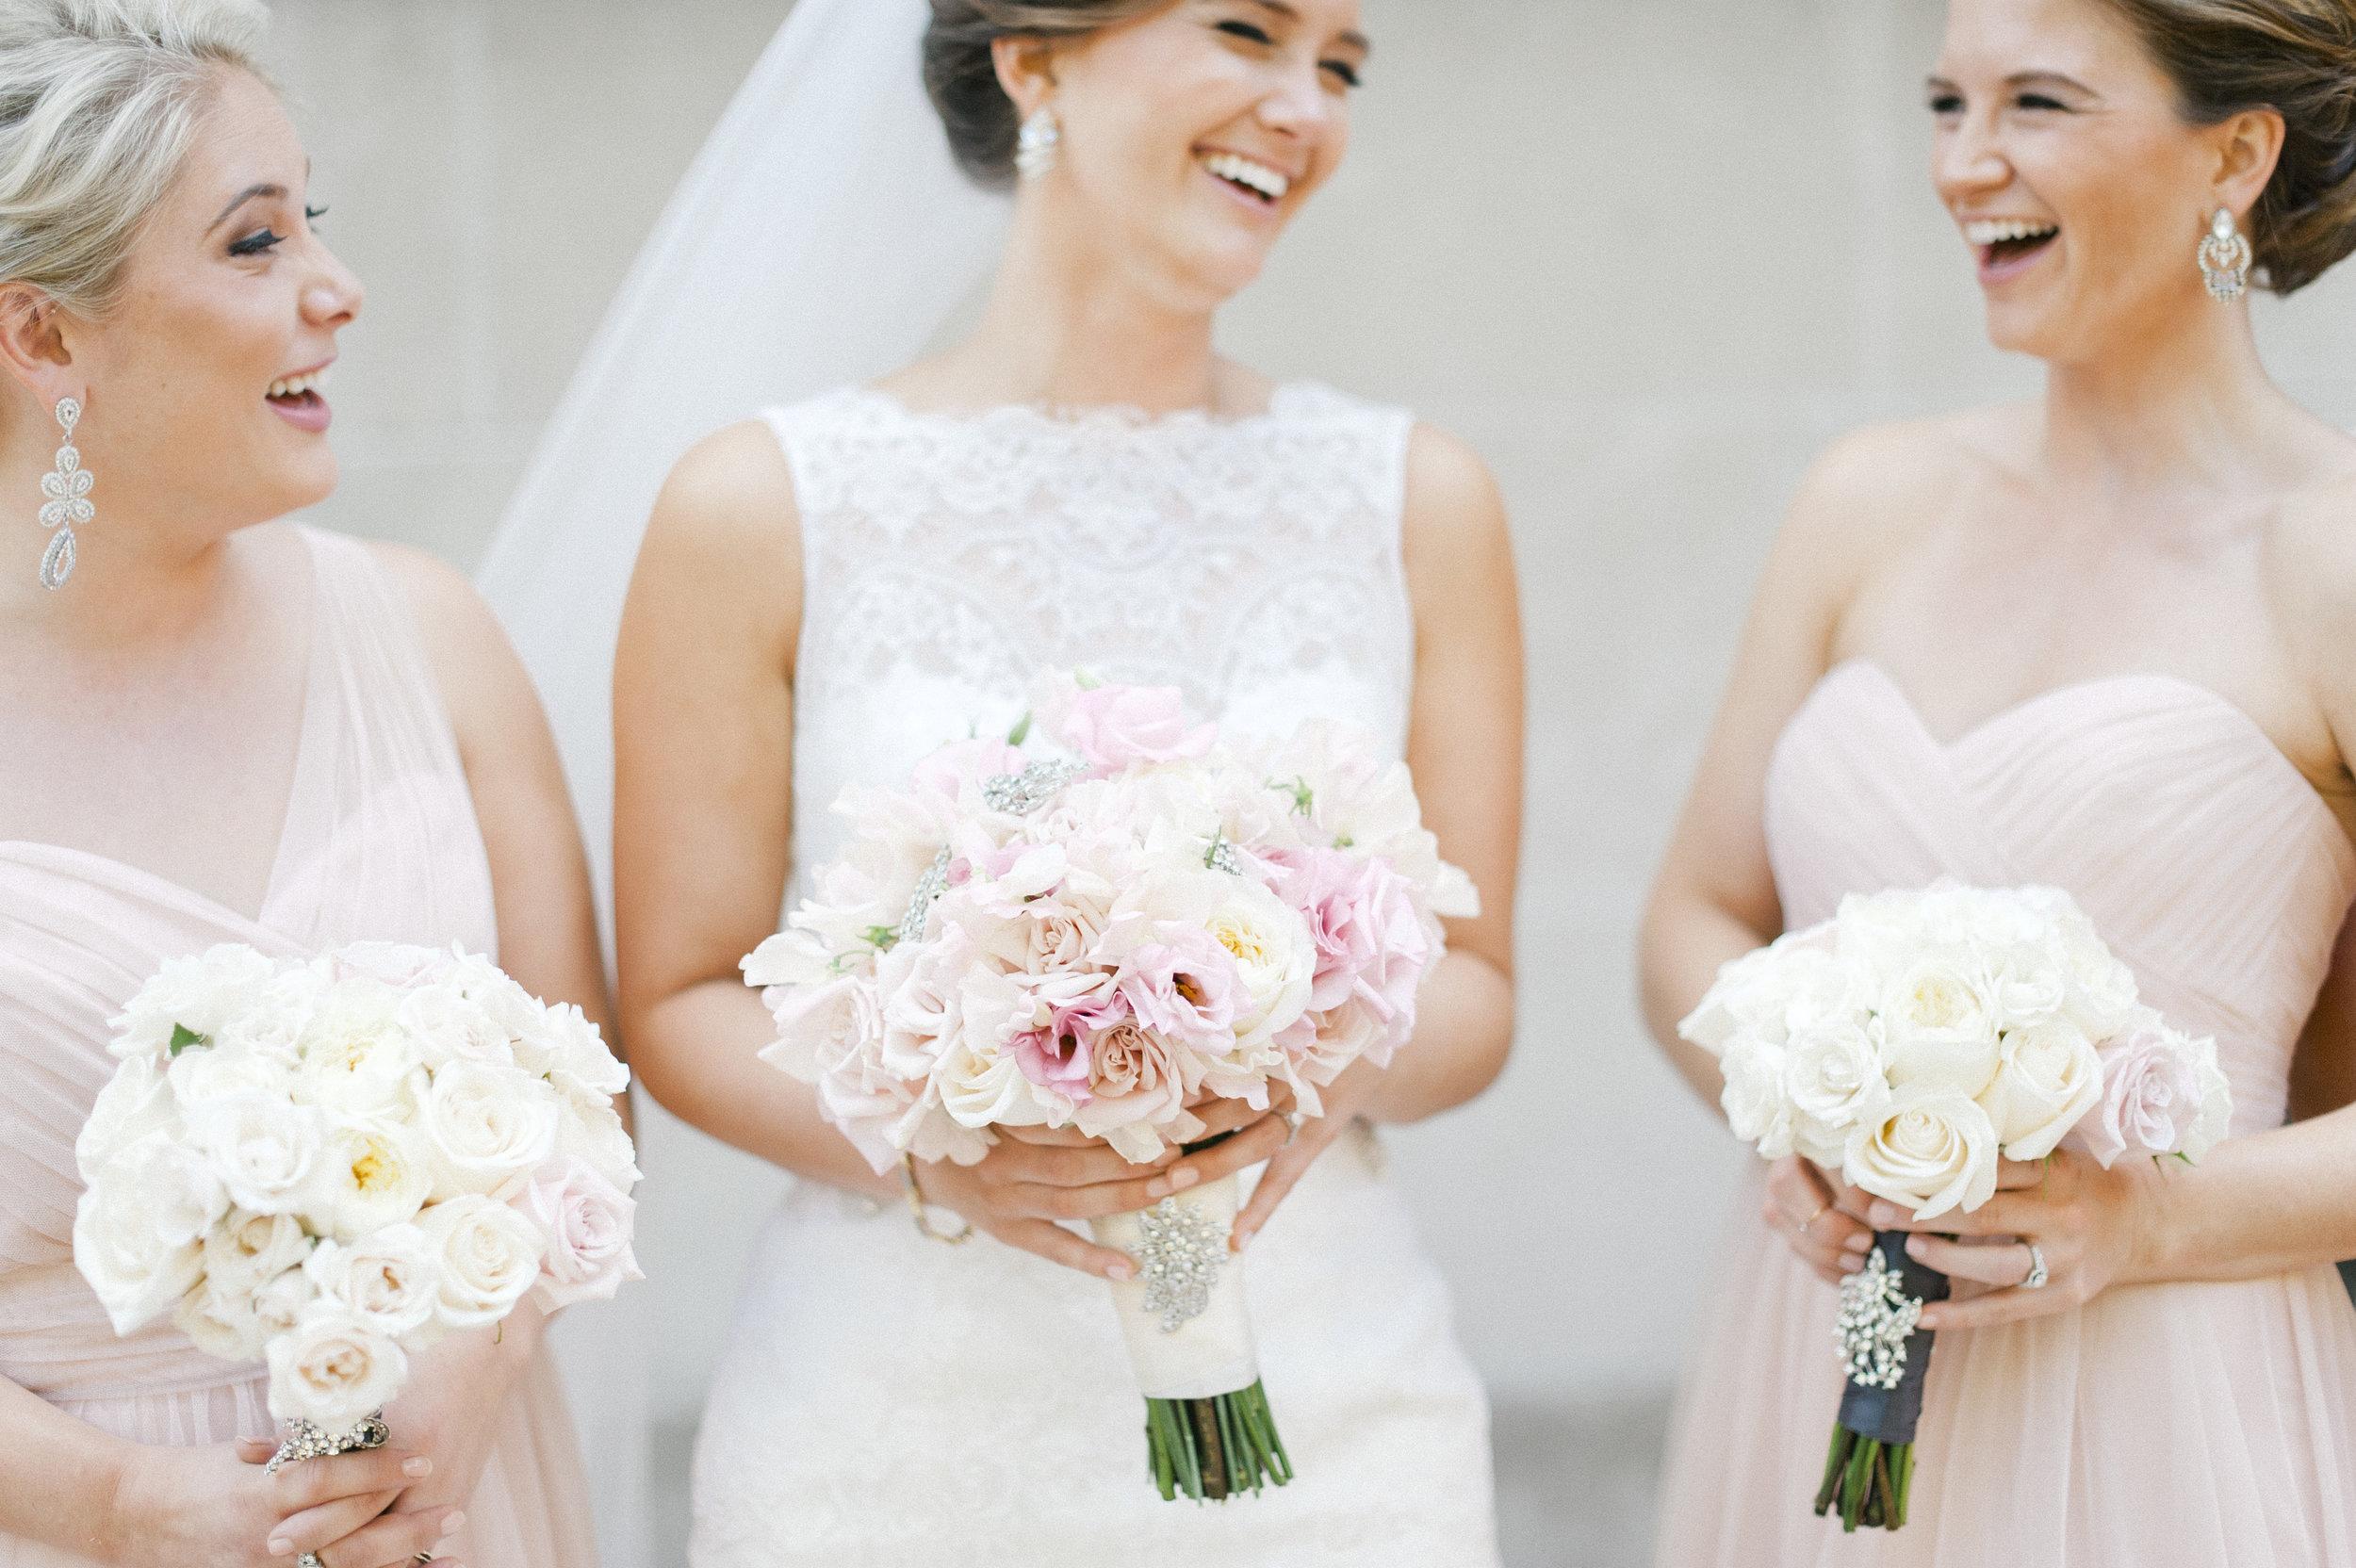 Lovell-Dillahunty Wedding_329.jpg